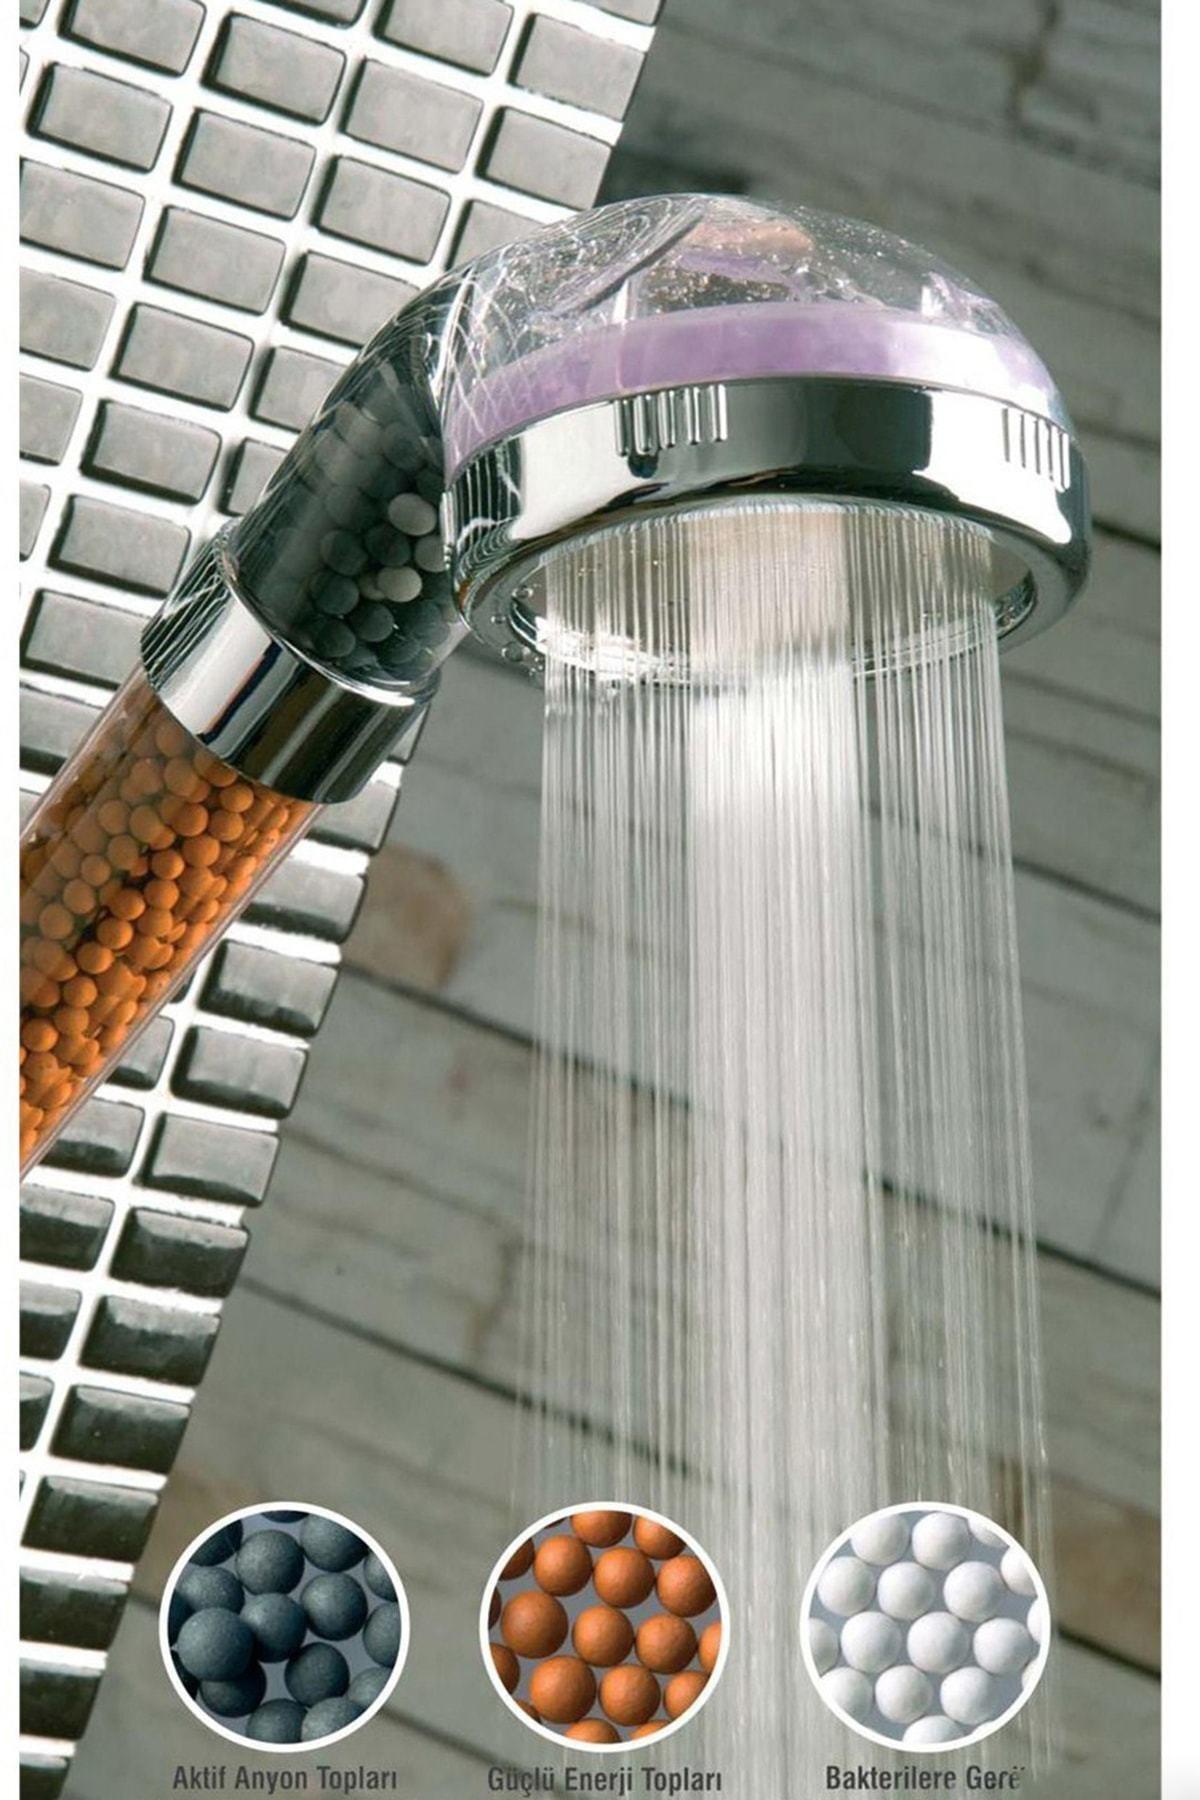 Buffer %50 Su Tasarruflu Ve Arıtmalı Doğal Taşlı Banyo El Duş Başlığı 2